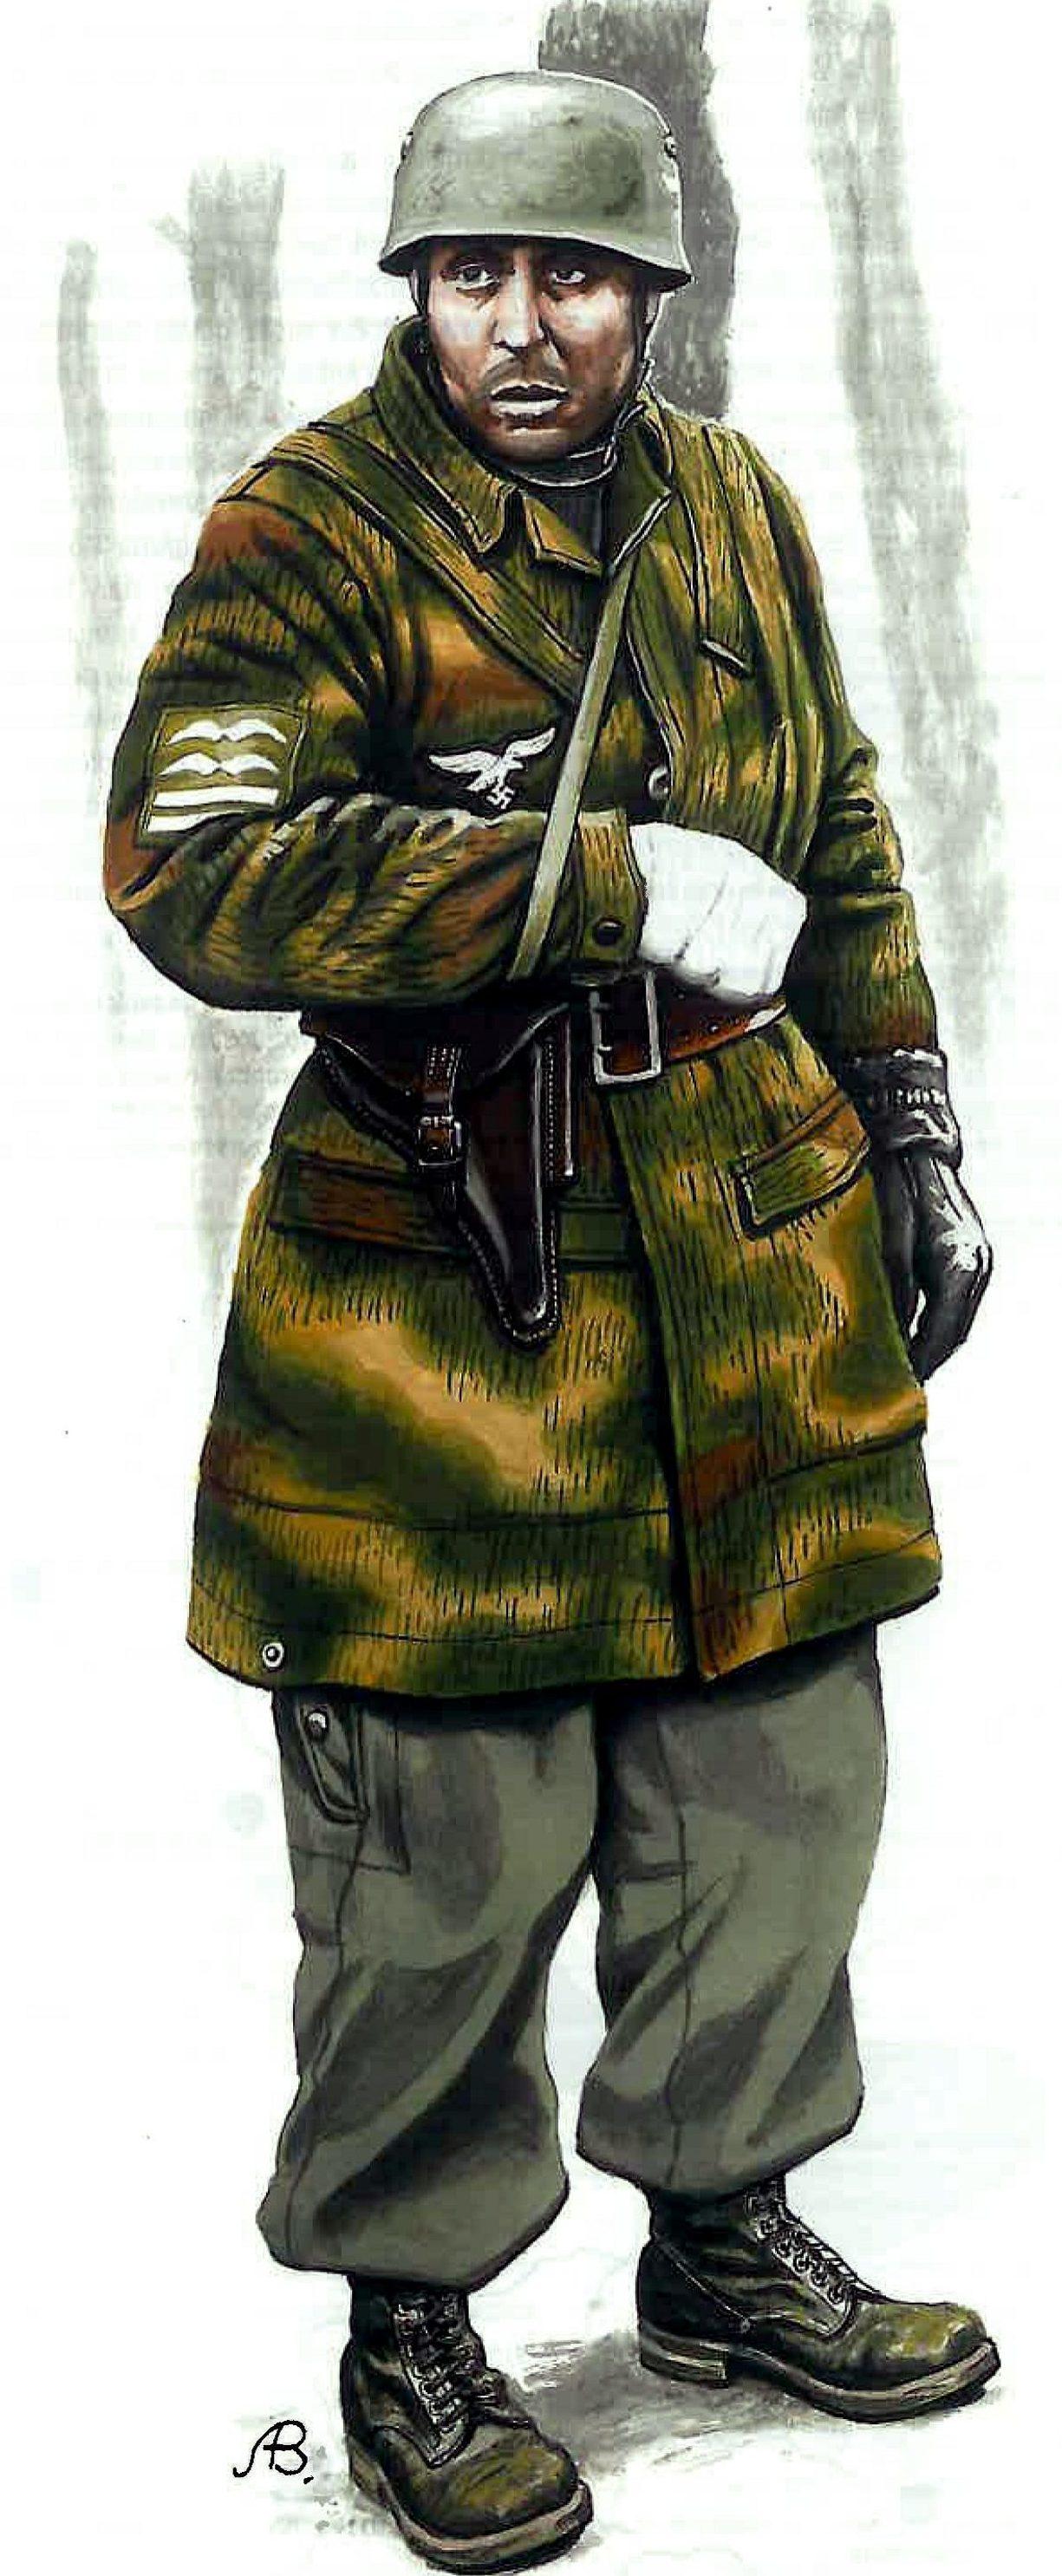 Bulczynki Arnold. Оберст-лейтенант парашютных частей Люфтваффе.